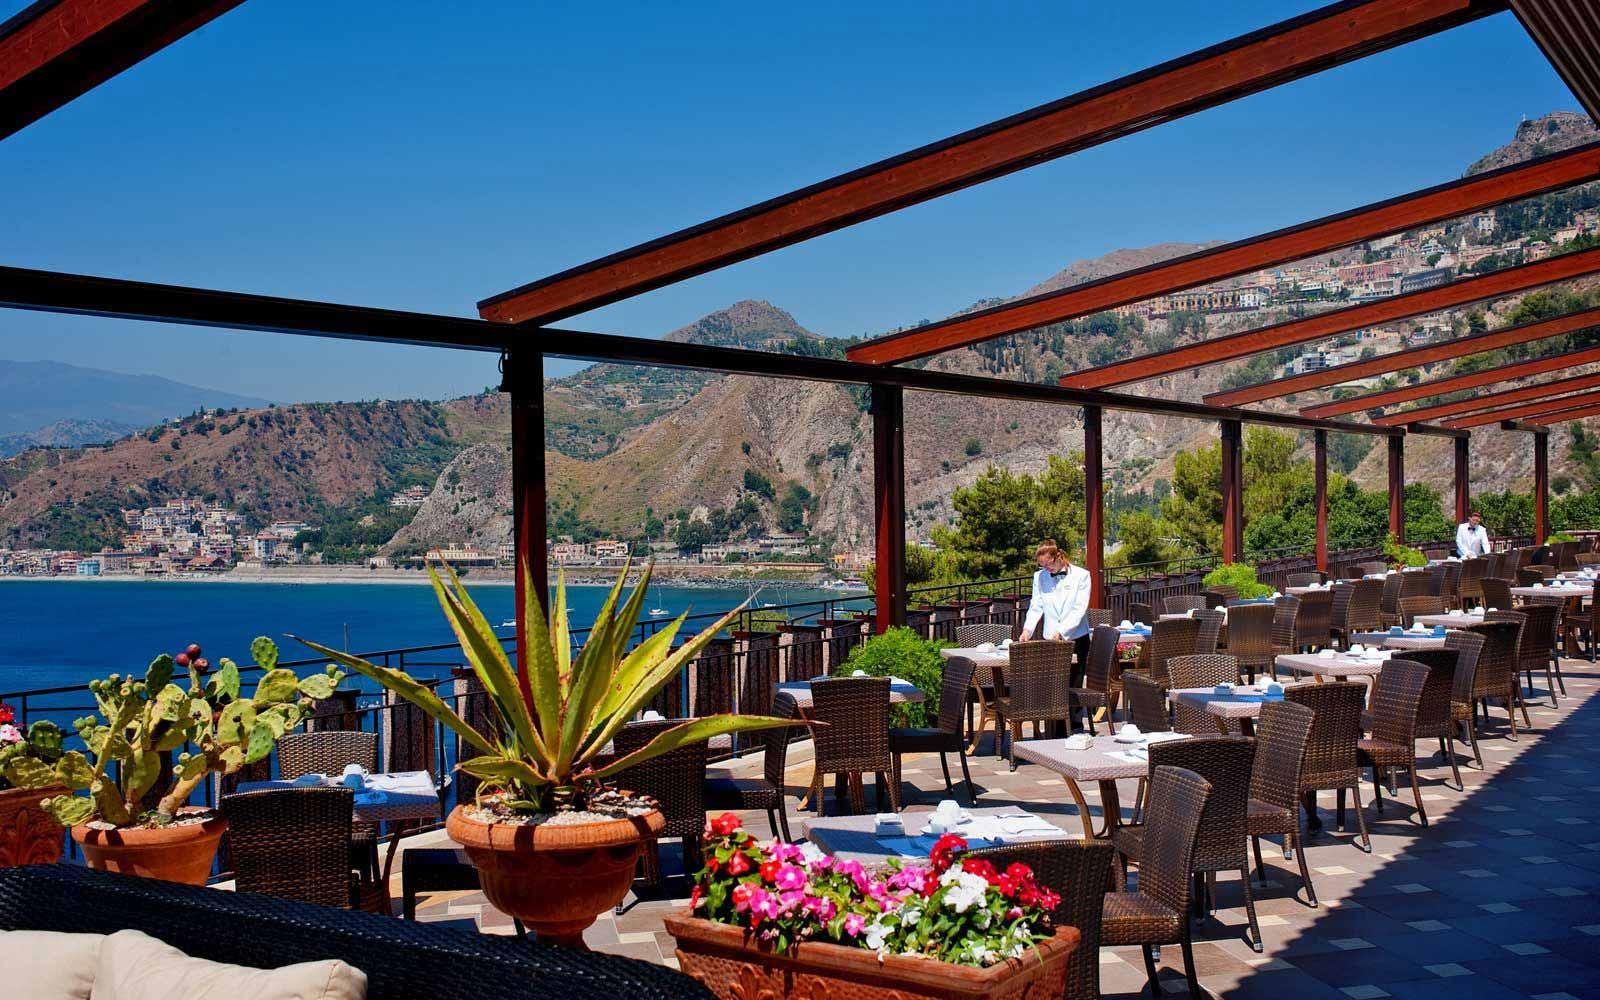 Terrace at Atahotel Capotaormina